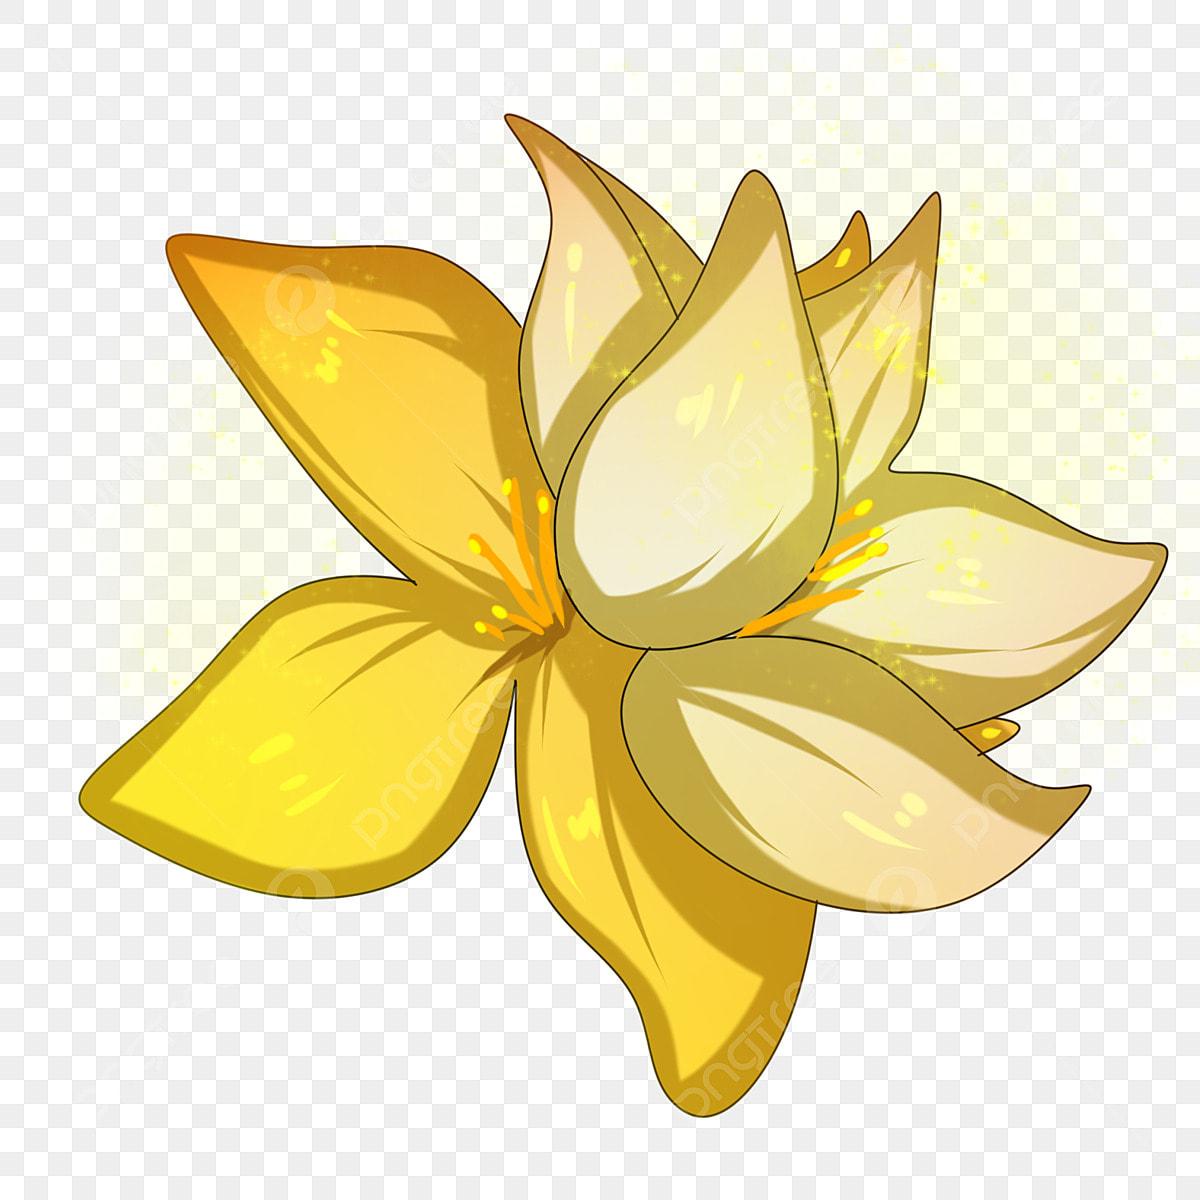 Golden Daffodil Clip Art